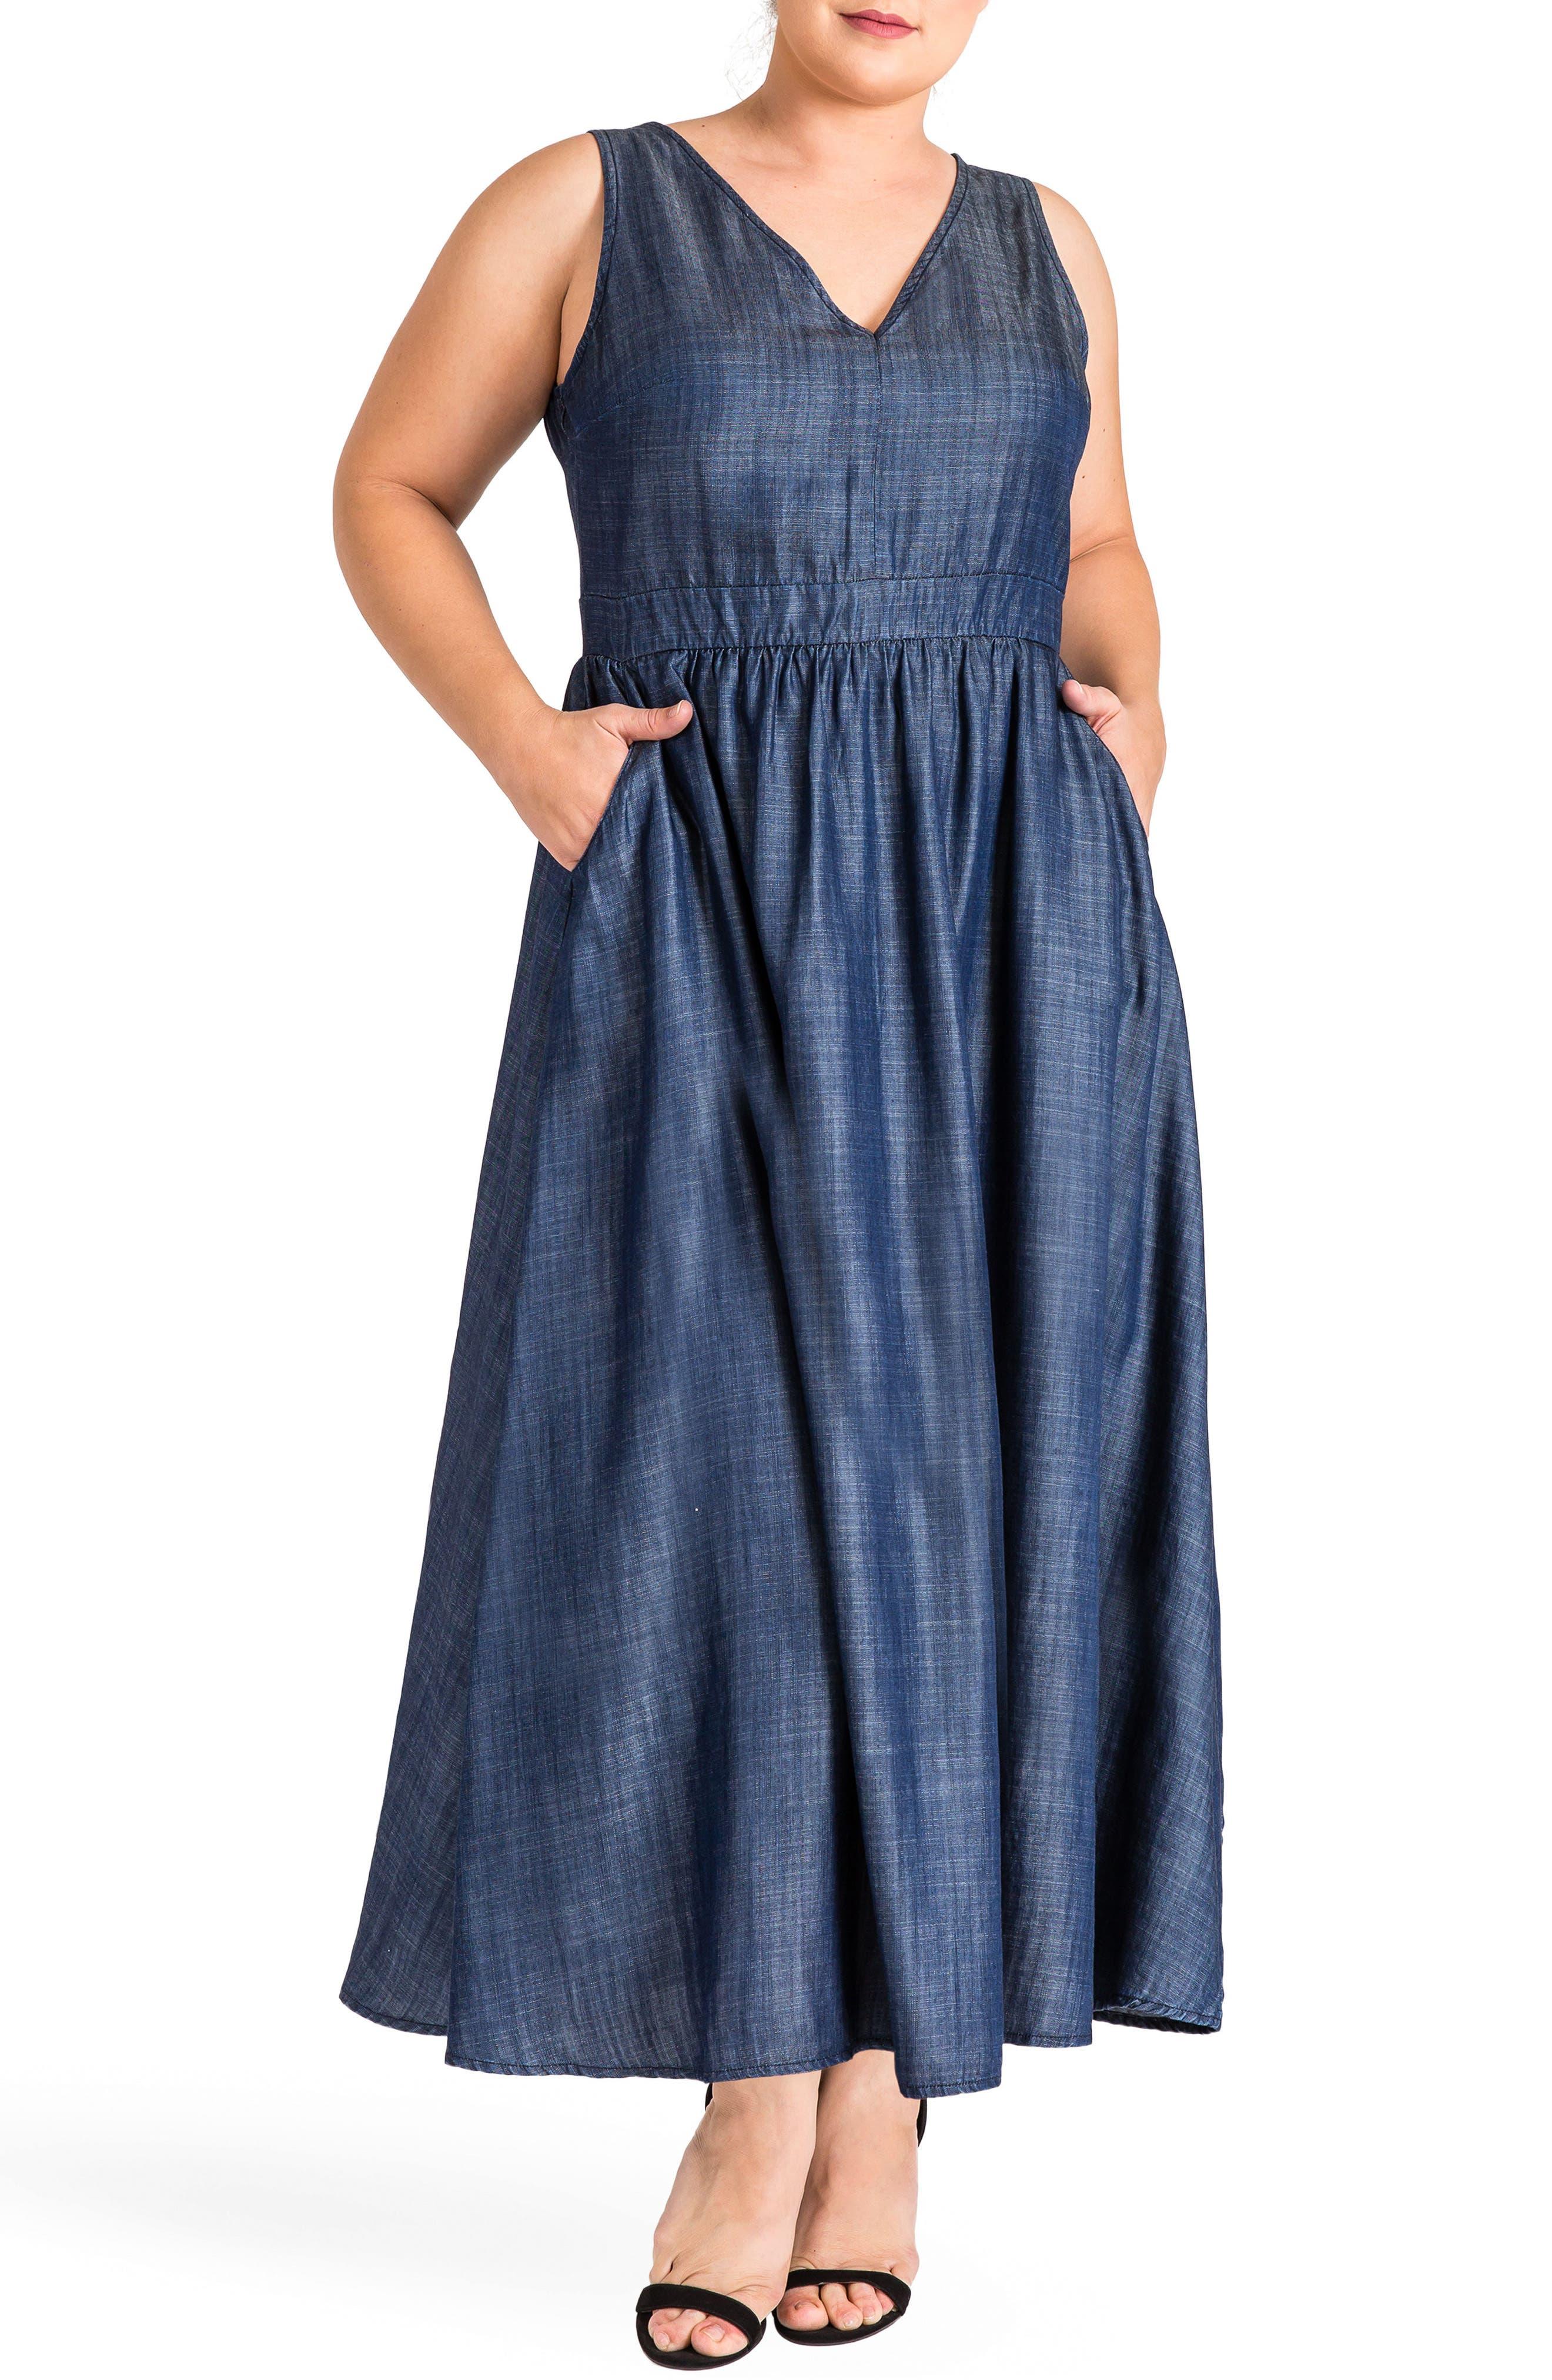 Plus size fit n flare dresses